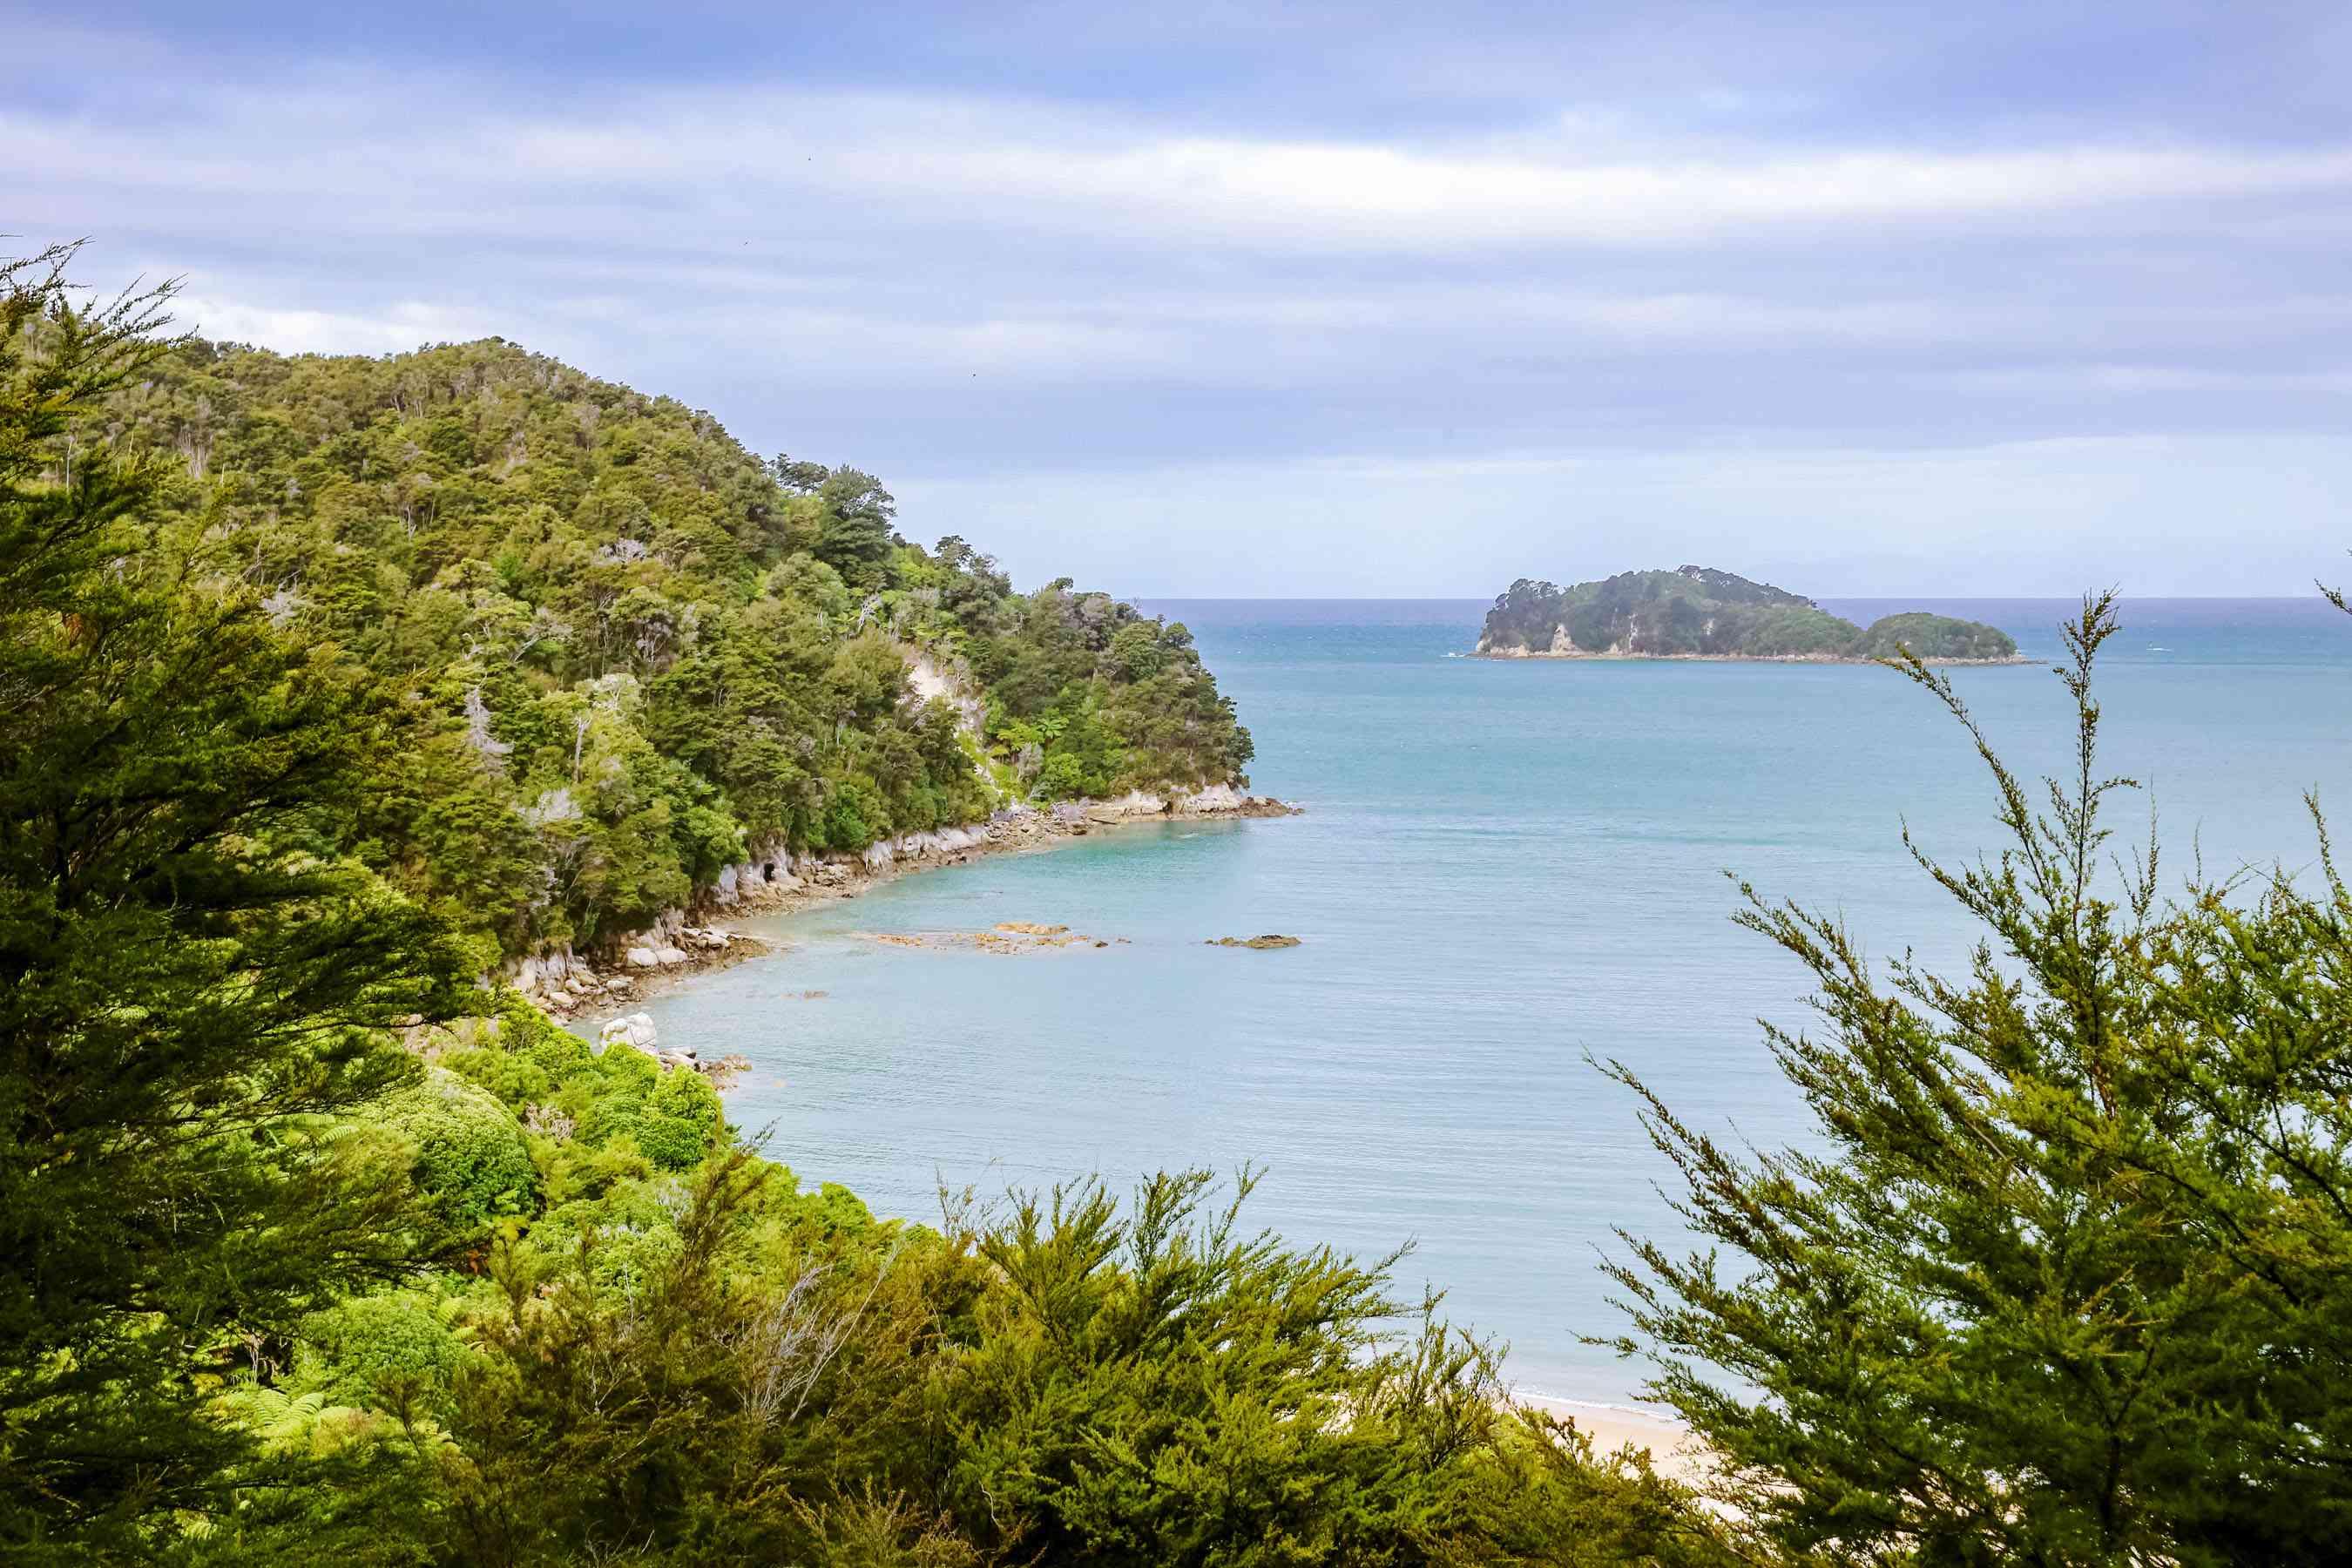 View of a blue sea on a green lush coasltine